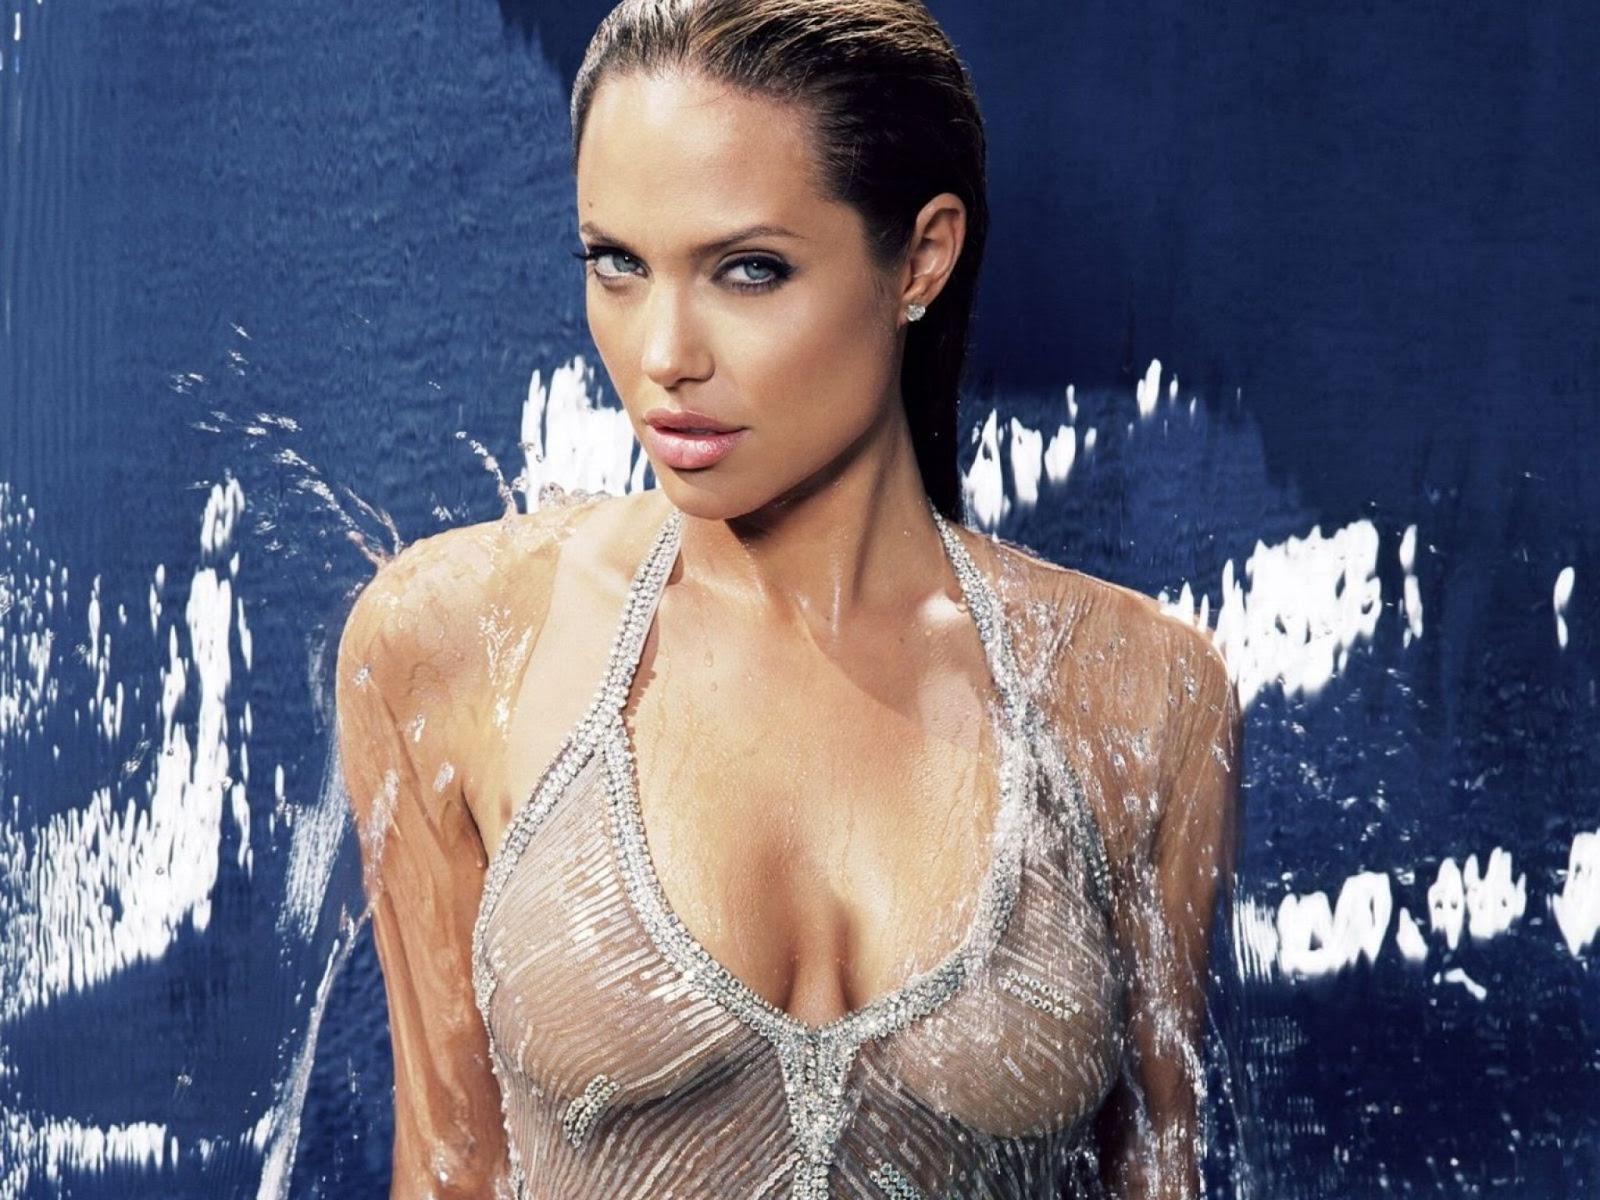 http://4.bp.blogspot.com/-XT4jJMSn2mc/UVPozi4aCkI/AAAAAAAABs8/eDAb476pph0/s1600/Angelina_Jolie.jpg